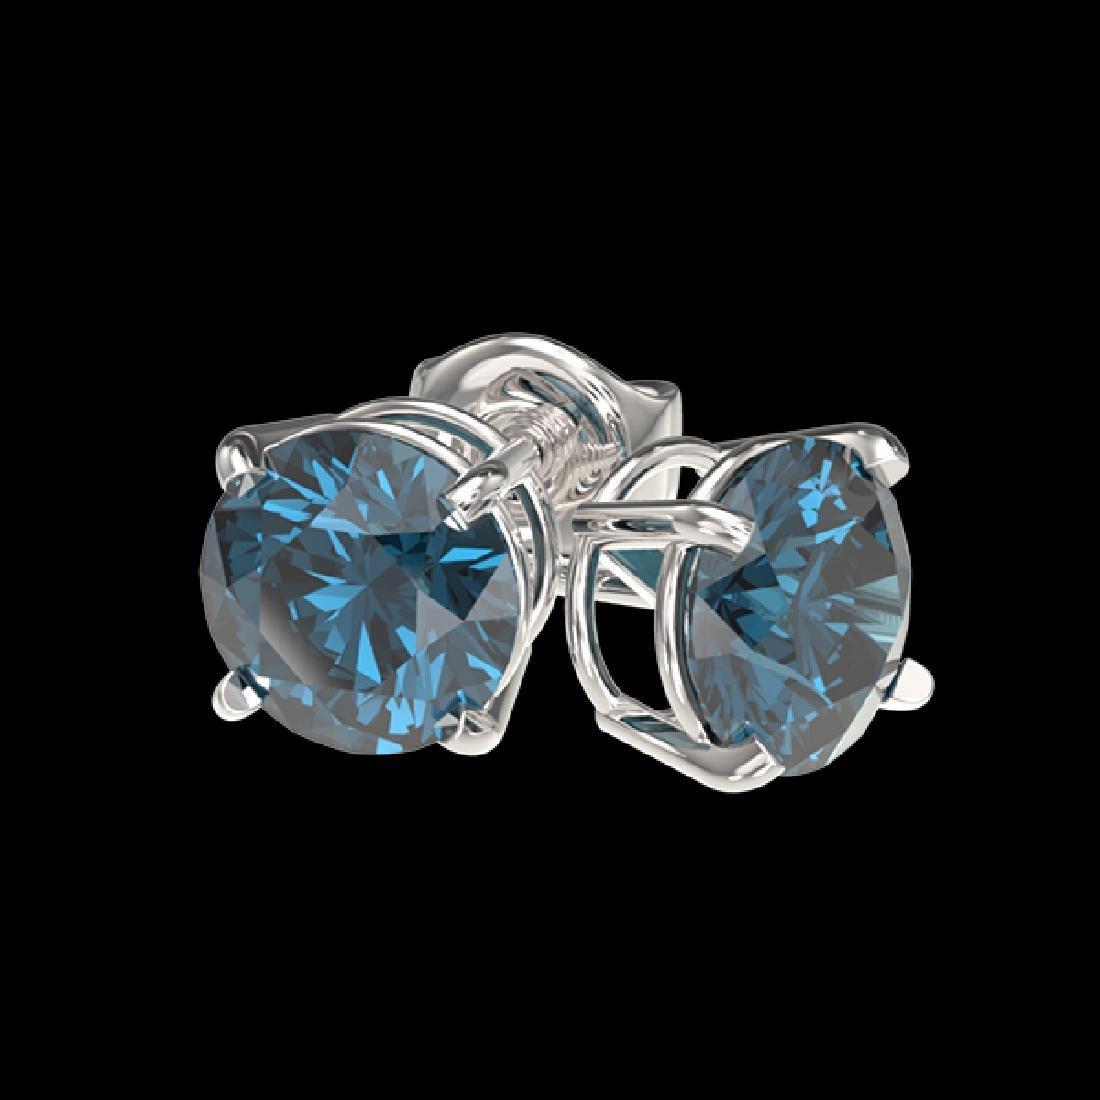 1 CTW Certified Intense Blue SI Diamond Solitaire Stud - 3